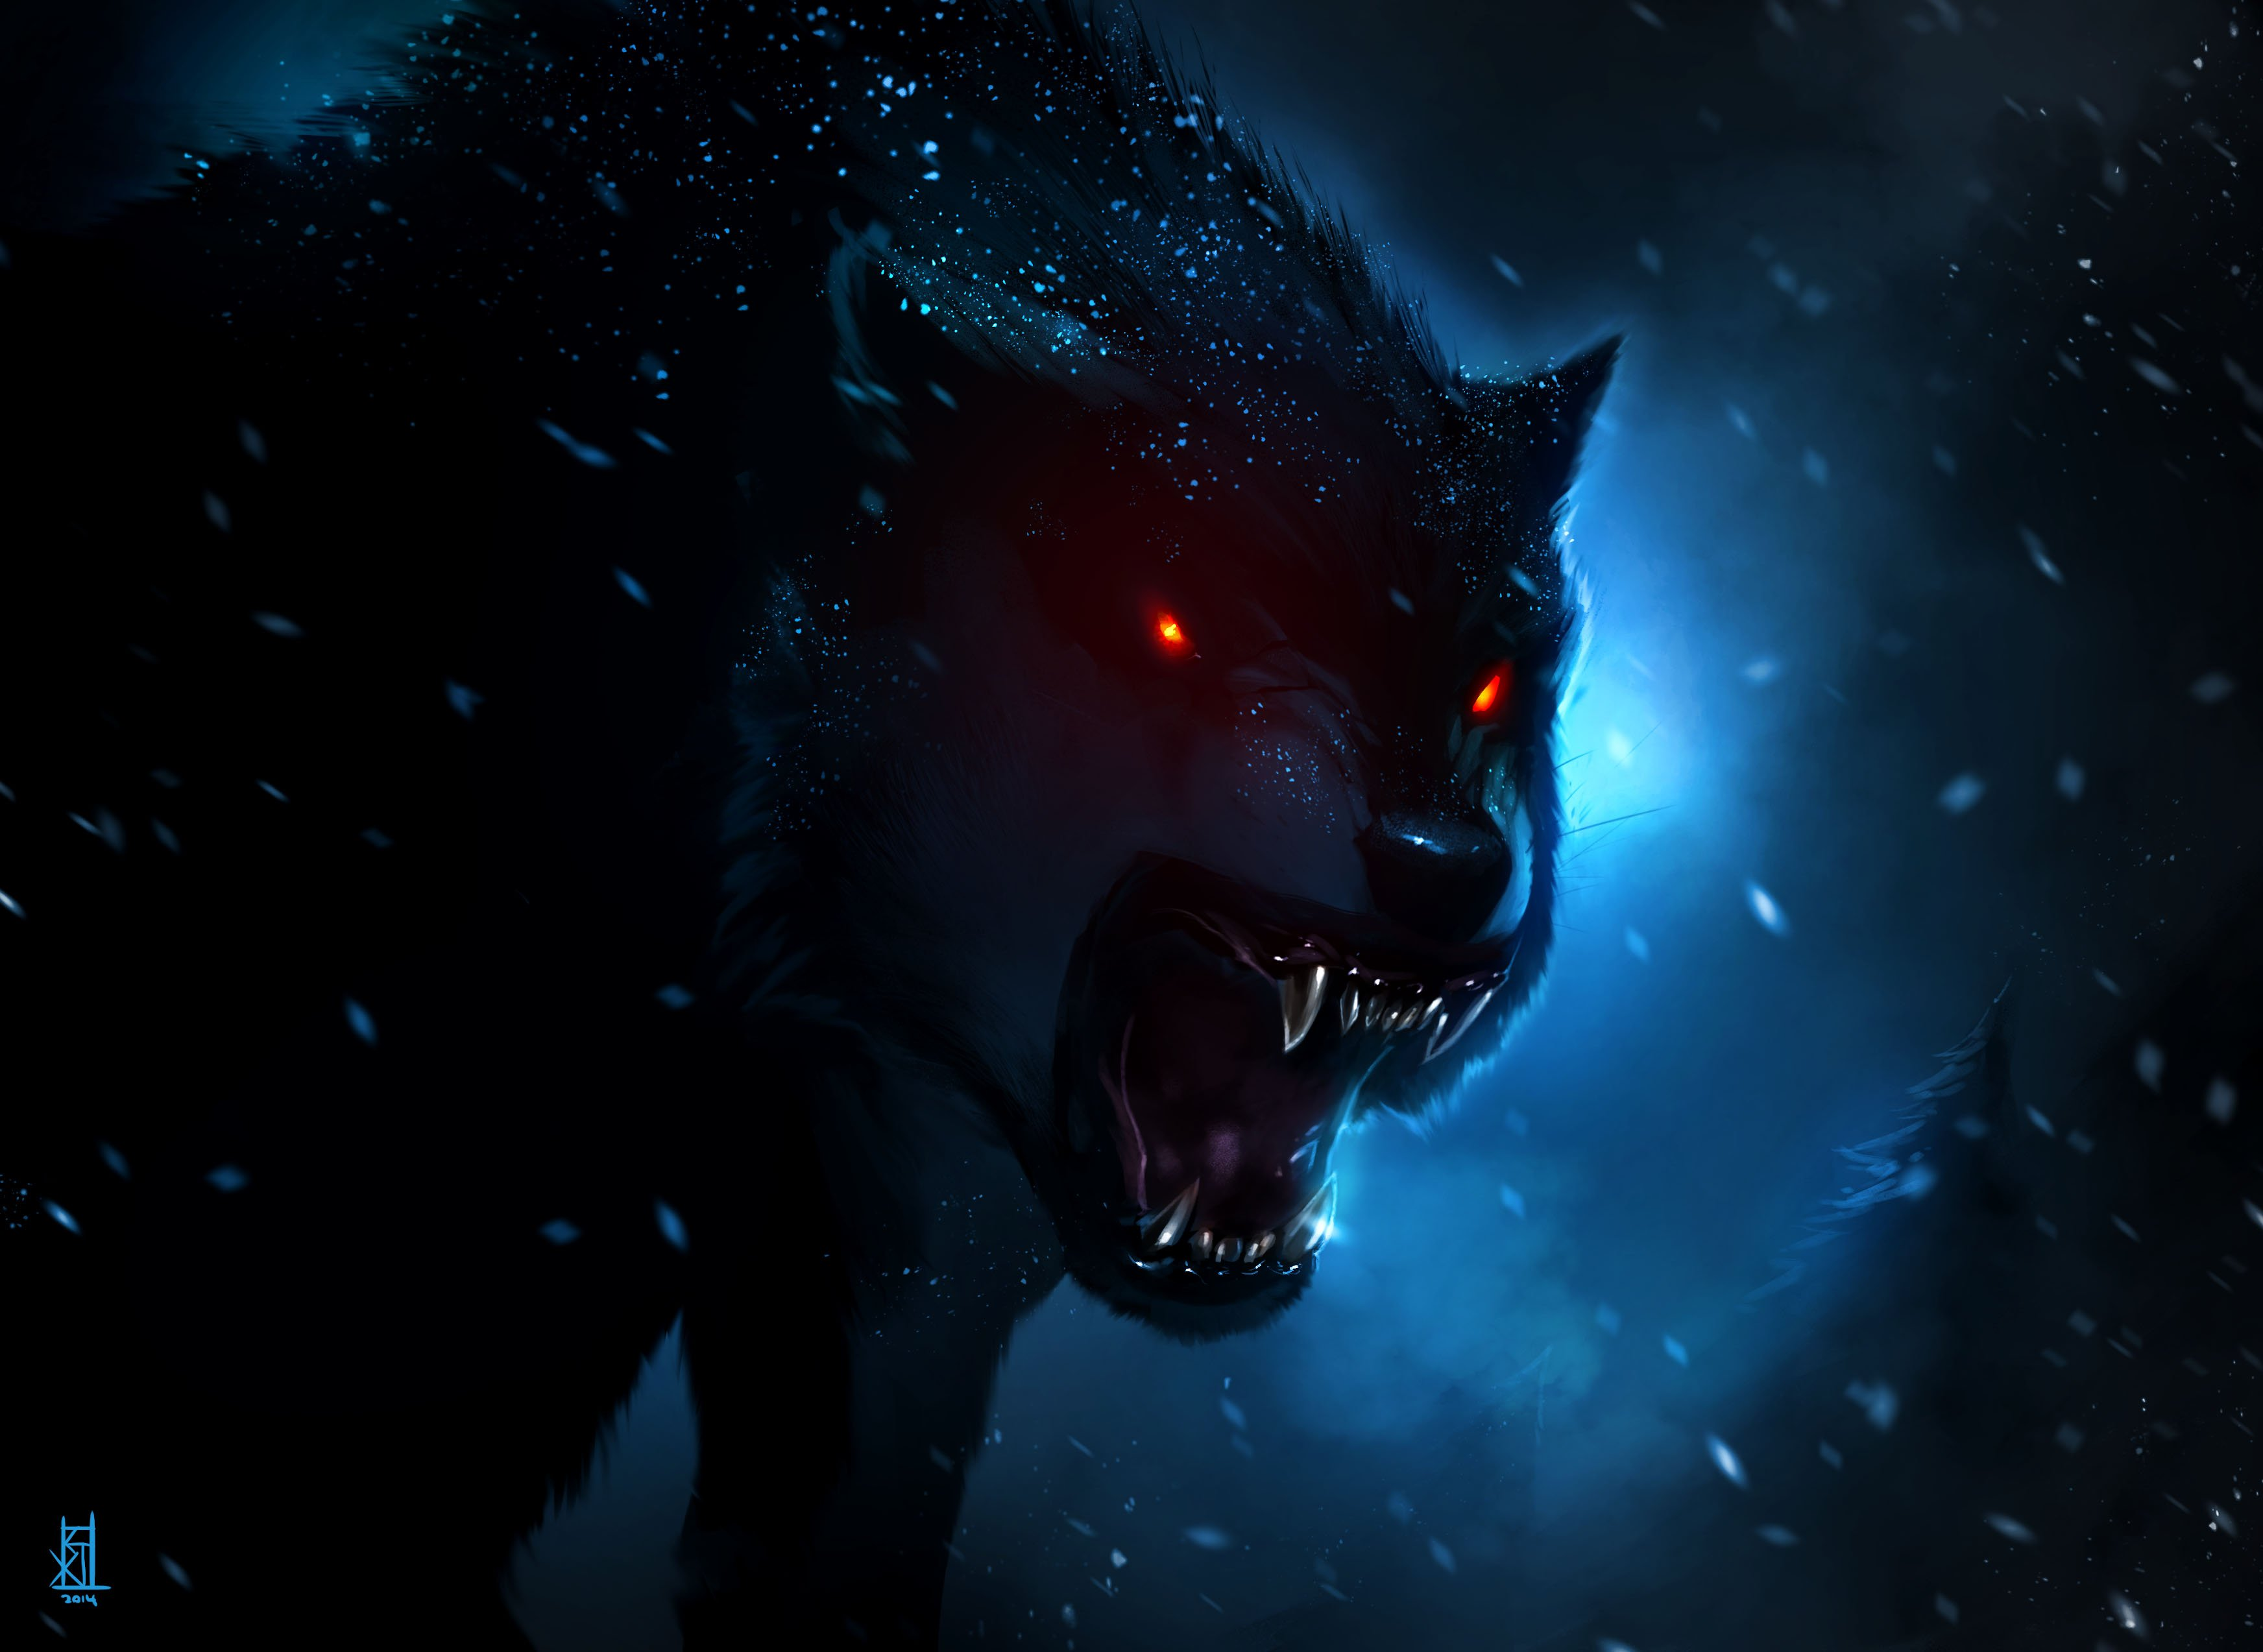 Wolf fantasy animal red eyes dark wallpaper | 3488x2547 ...